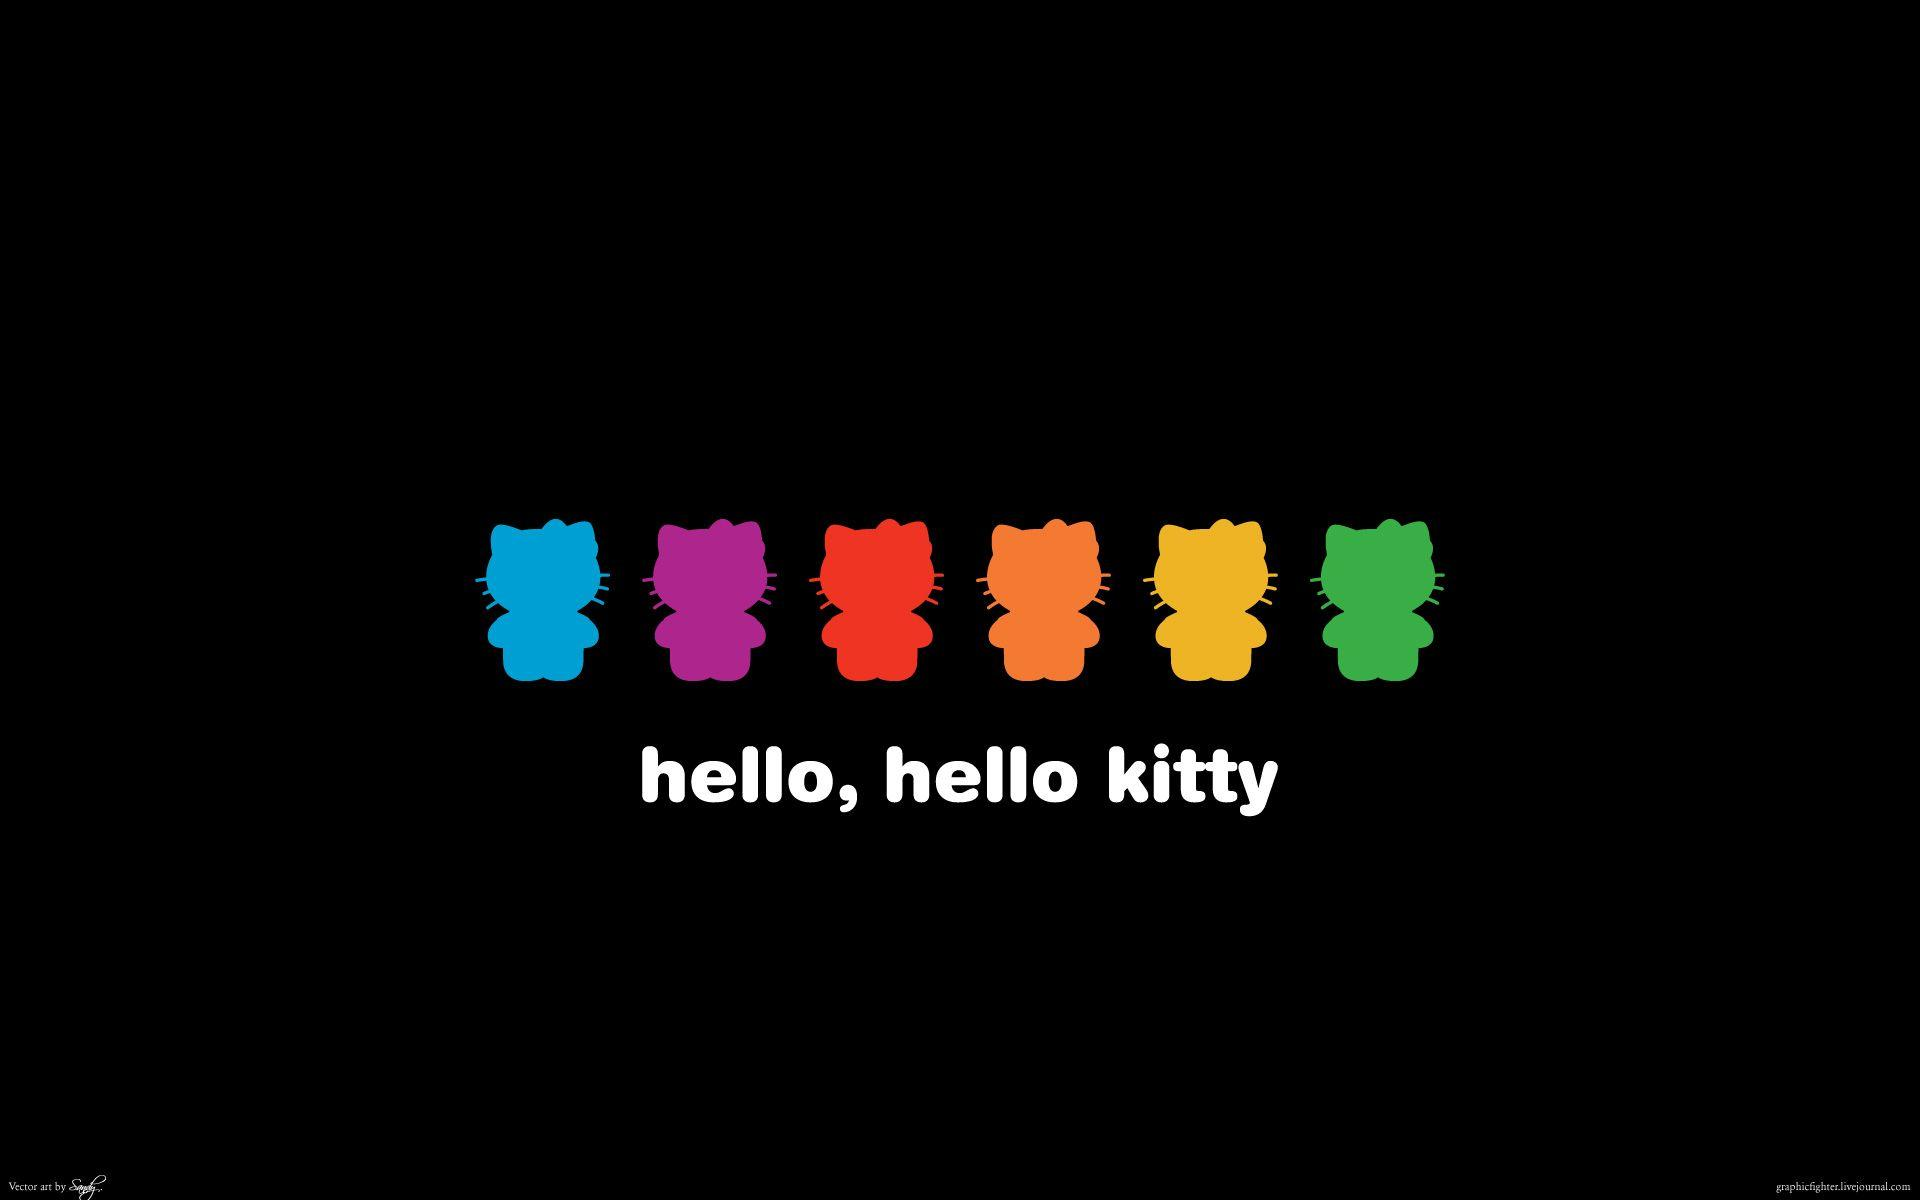 Fantastic Wallpaper Hello Kitty Ipad 2 - FiPaCGx  Best Photo Reference_29513.jpg